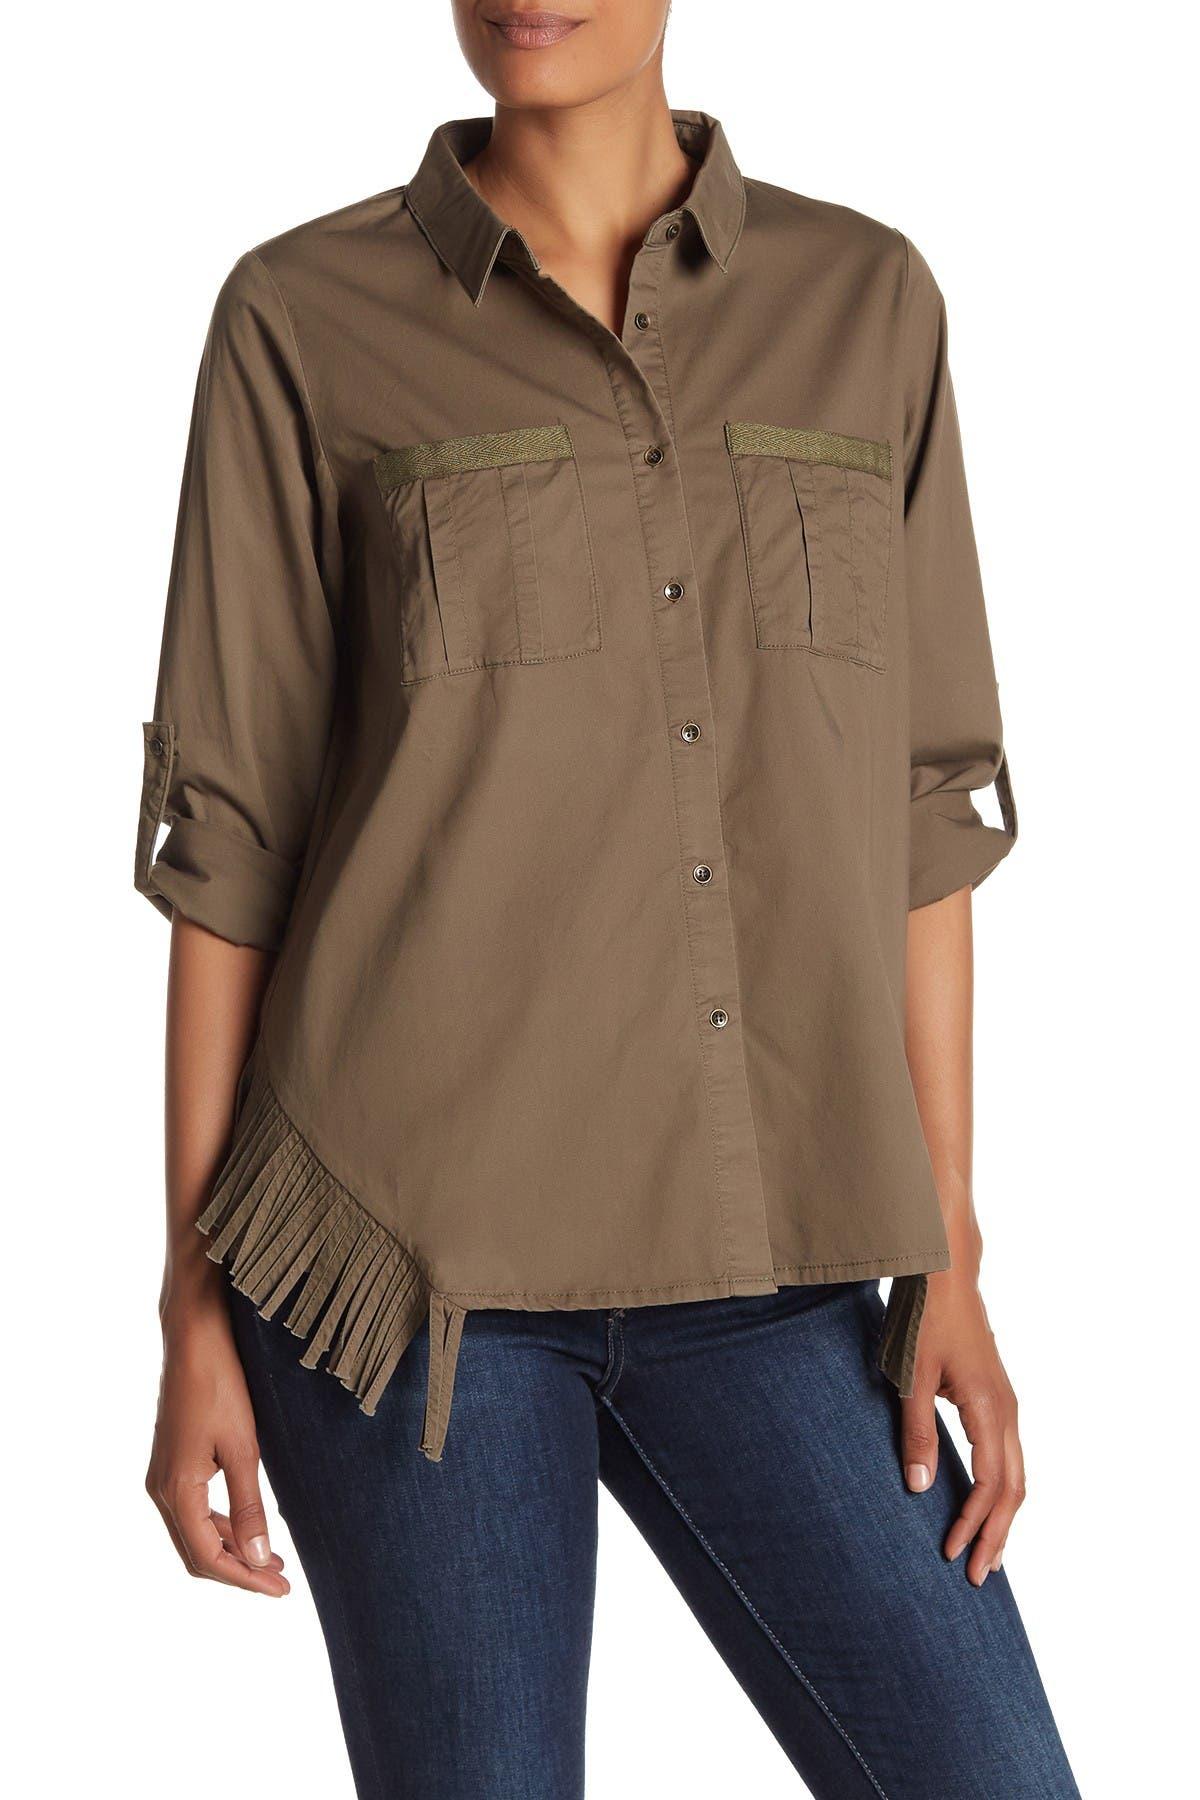 Image of Heartloom Callia Front Button Fringe Trim Jacket